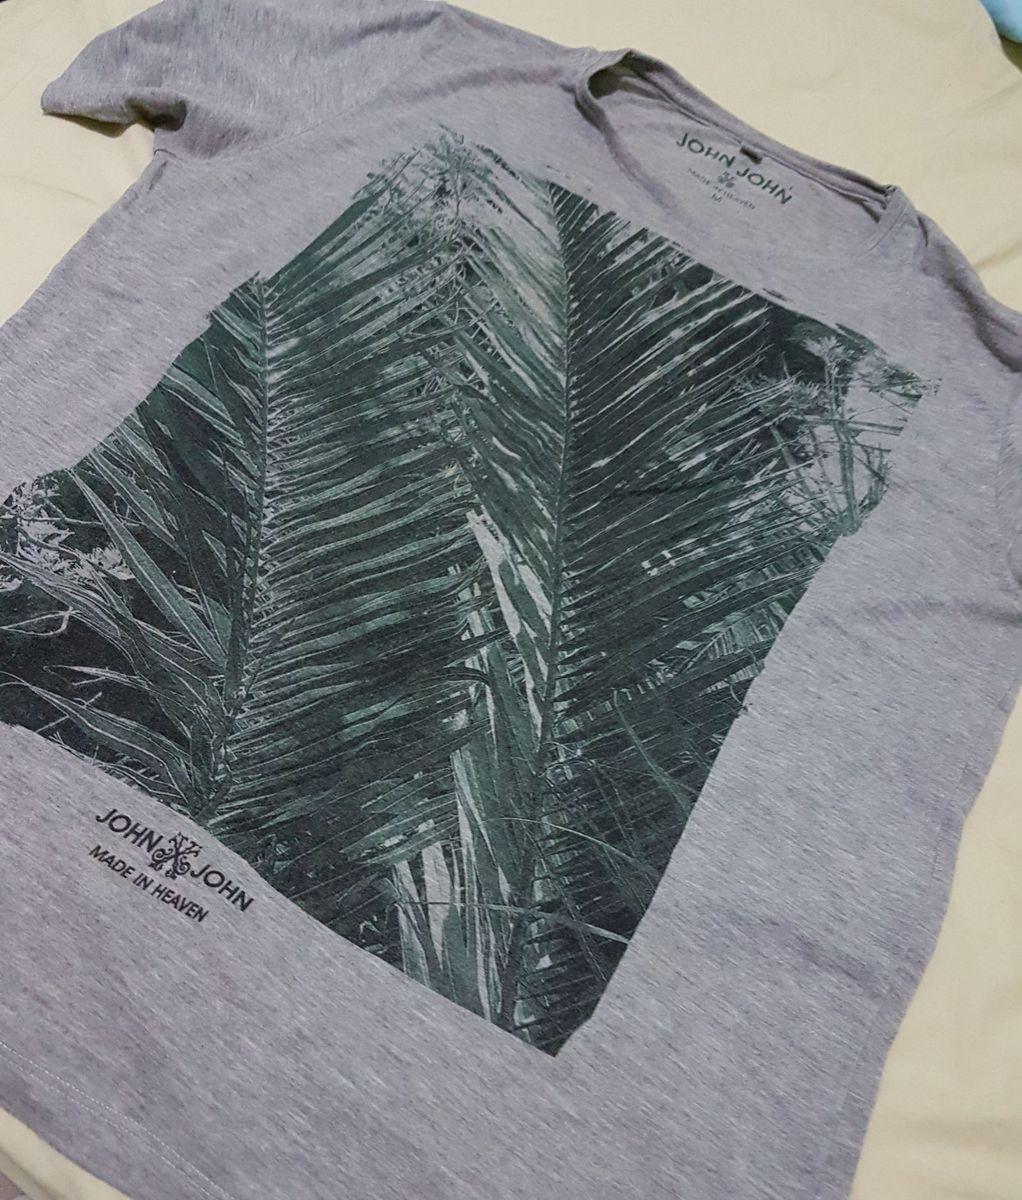 c12f1e031b camiseta basica john john - camisetas john john.  Czm6ly9wag90b3muzw5qb2vplmnvbs5ici9wcm9kdwn0cy8ynjm5mjivmzdimdljmjrlogqzmtjmmjriothmzwq5mjhhzda4m2uuanbn  ...